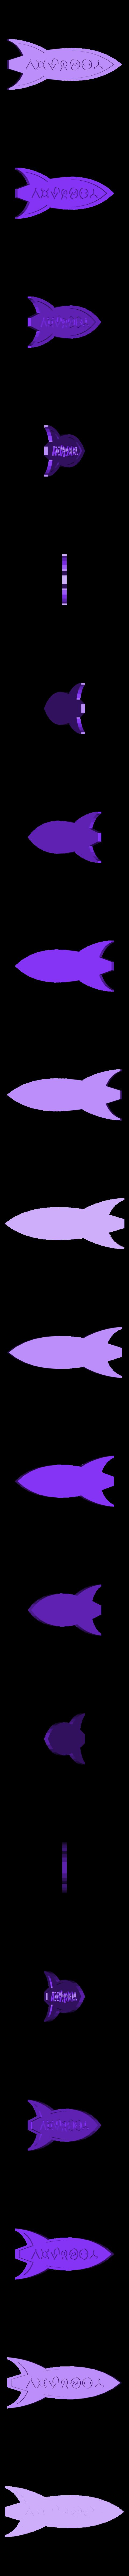 futu_3dprint.stl Download free STL file Customizable Futurama Rocket With Alien Text • 3D printer model, ferjerez3d